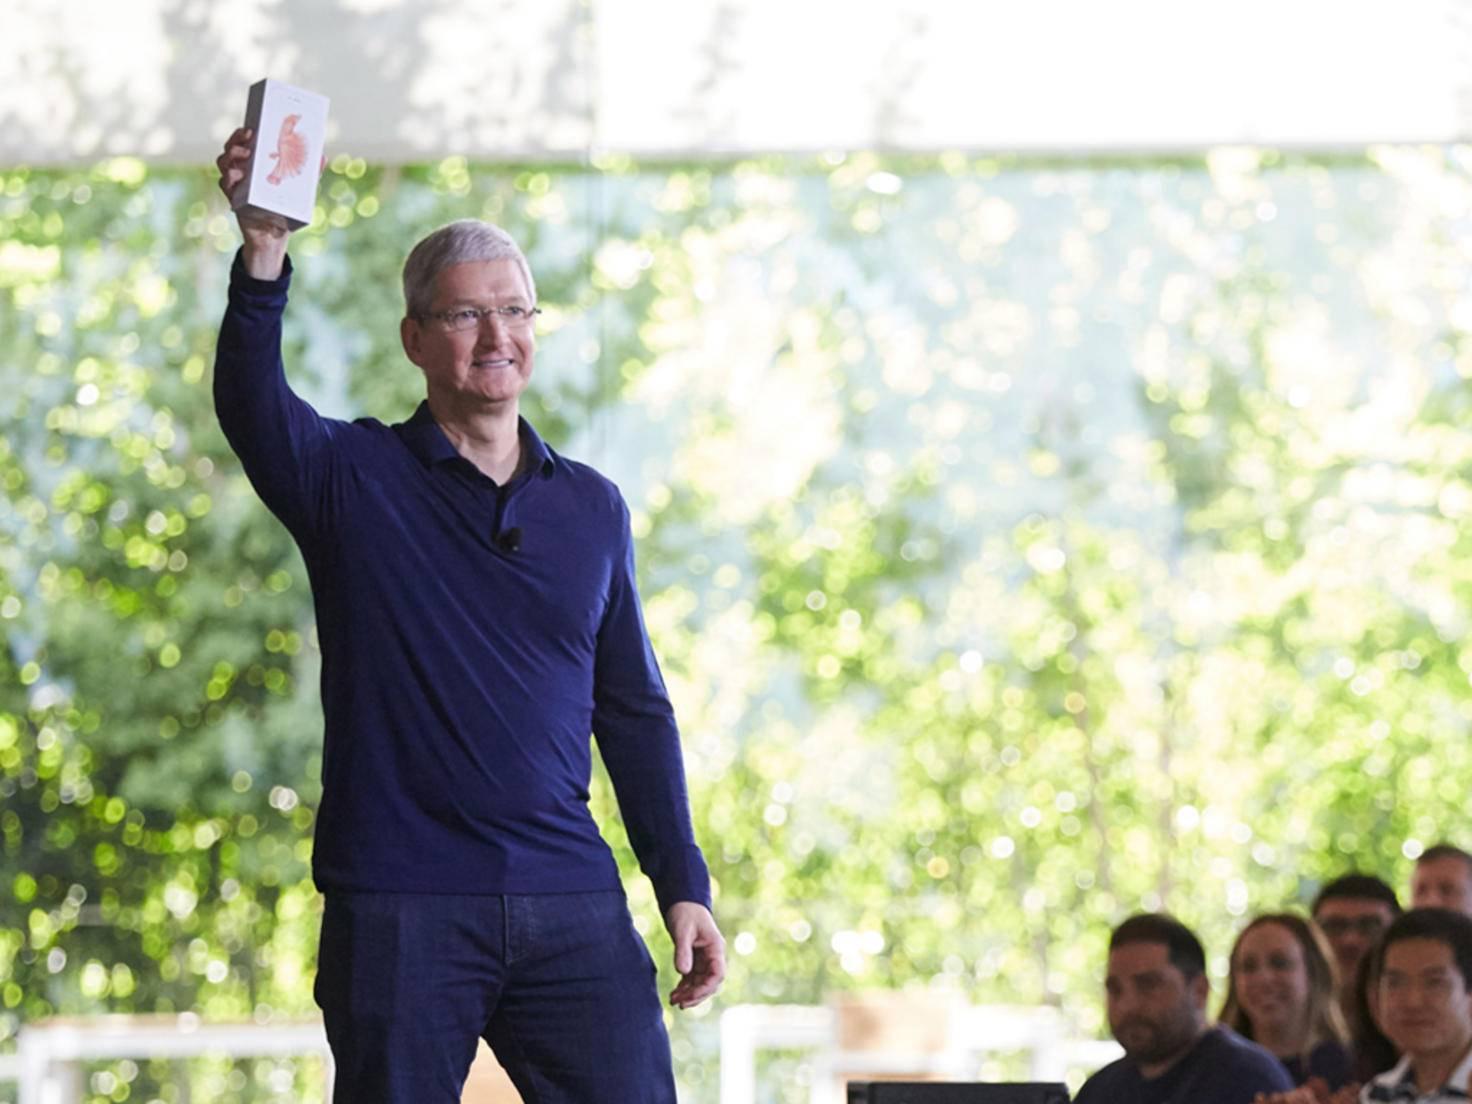 iPhone Tim Cook